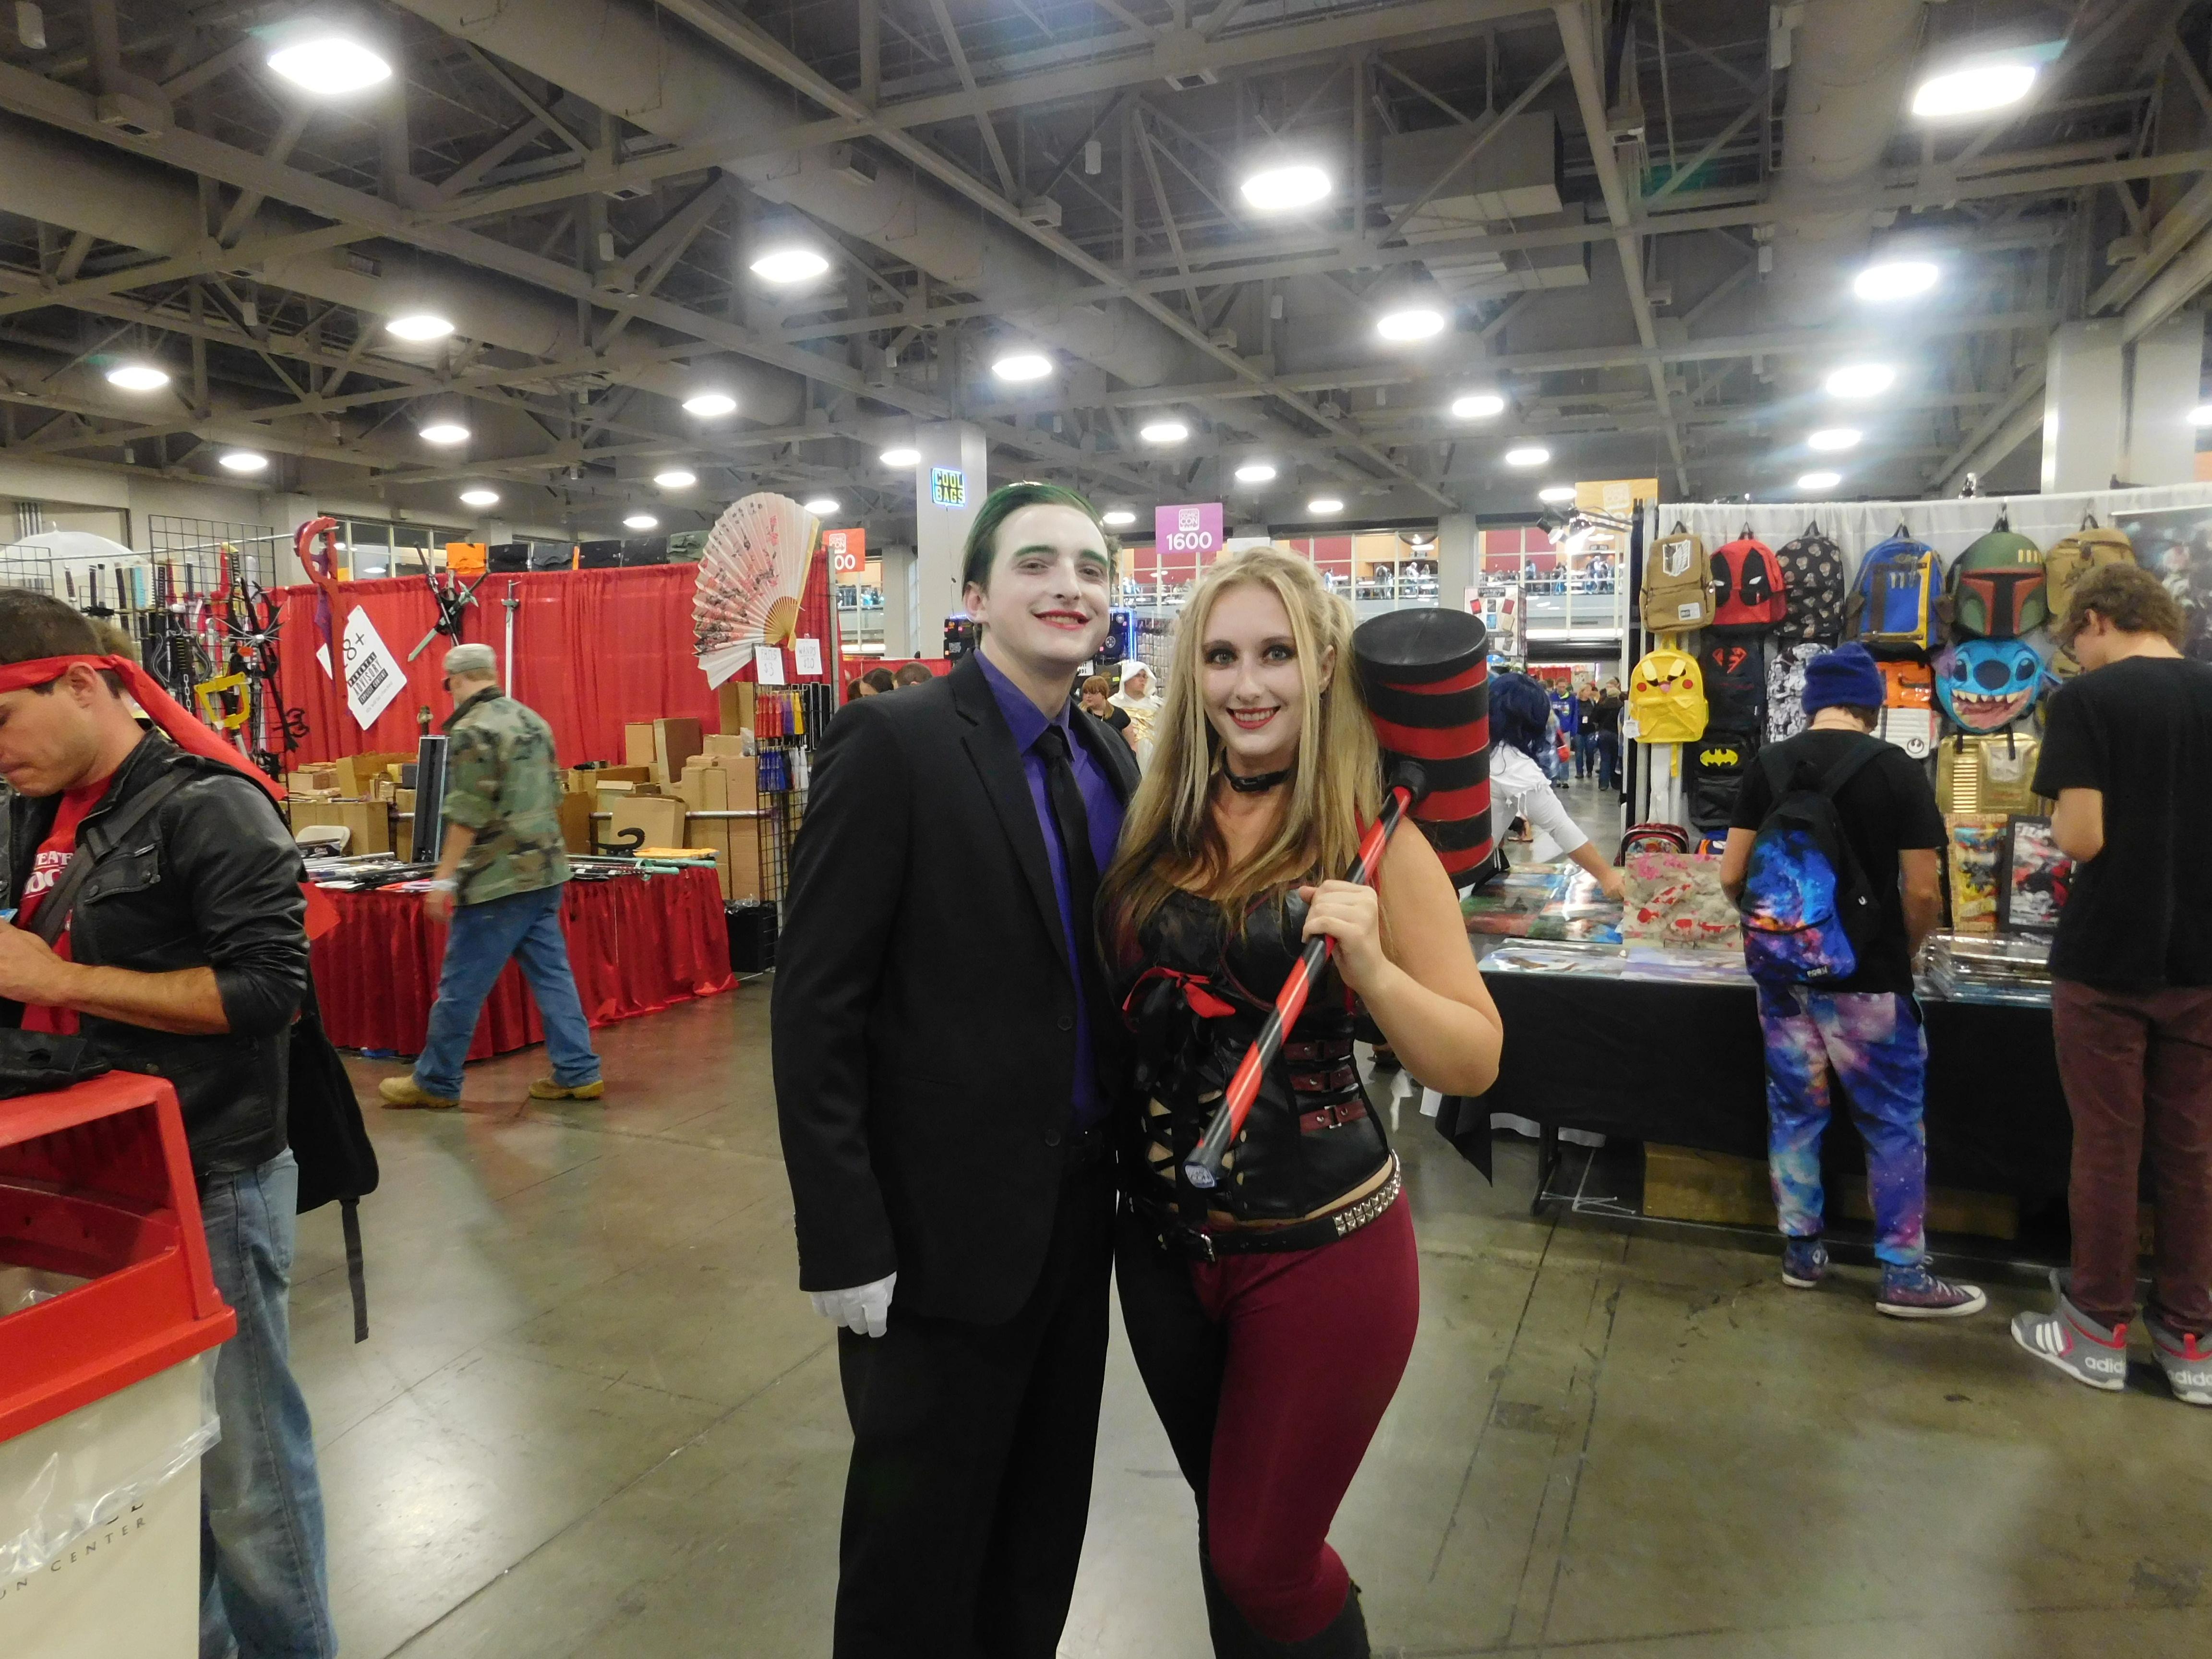 SLCCd2.012 - Joker and Harley make an appearance.